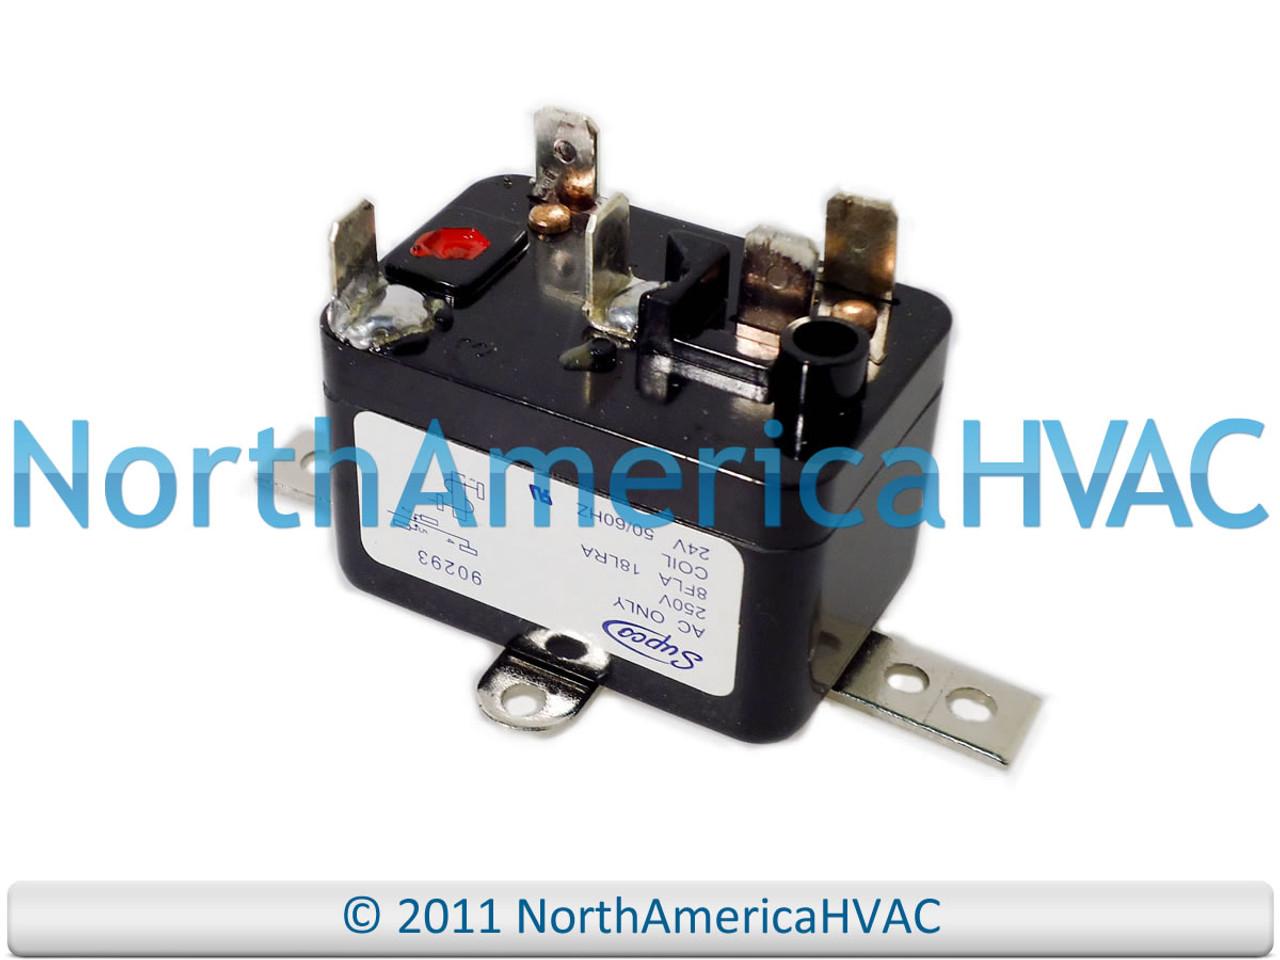 Mars White Rodgers Steveco Furnace Fan Blower Relay- 24 volt coil 90293Q  90-293Q - North America HVACNorth America HVAC